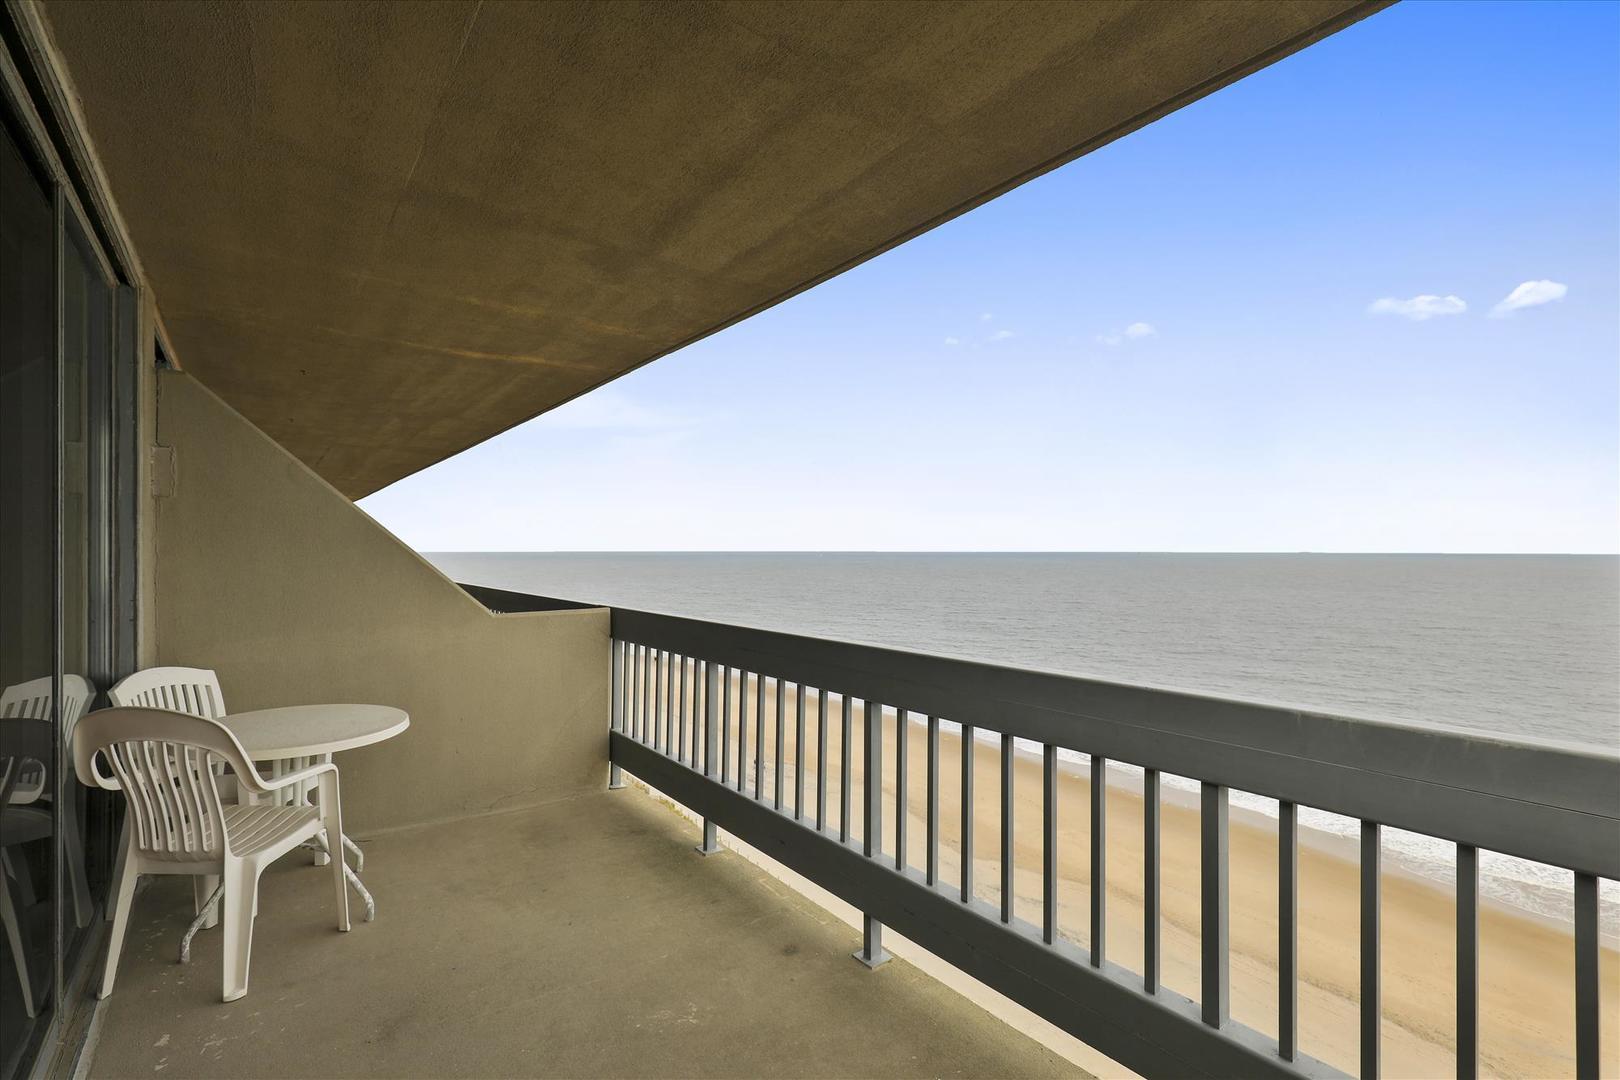 Century I 1401 - Oceanfront Balcony off of Living Room